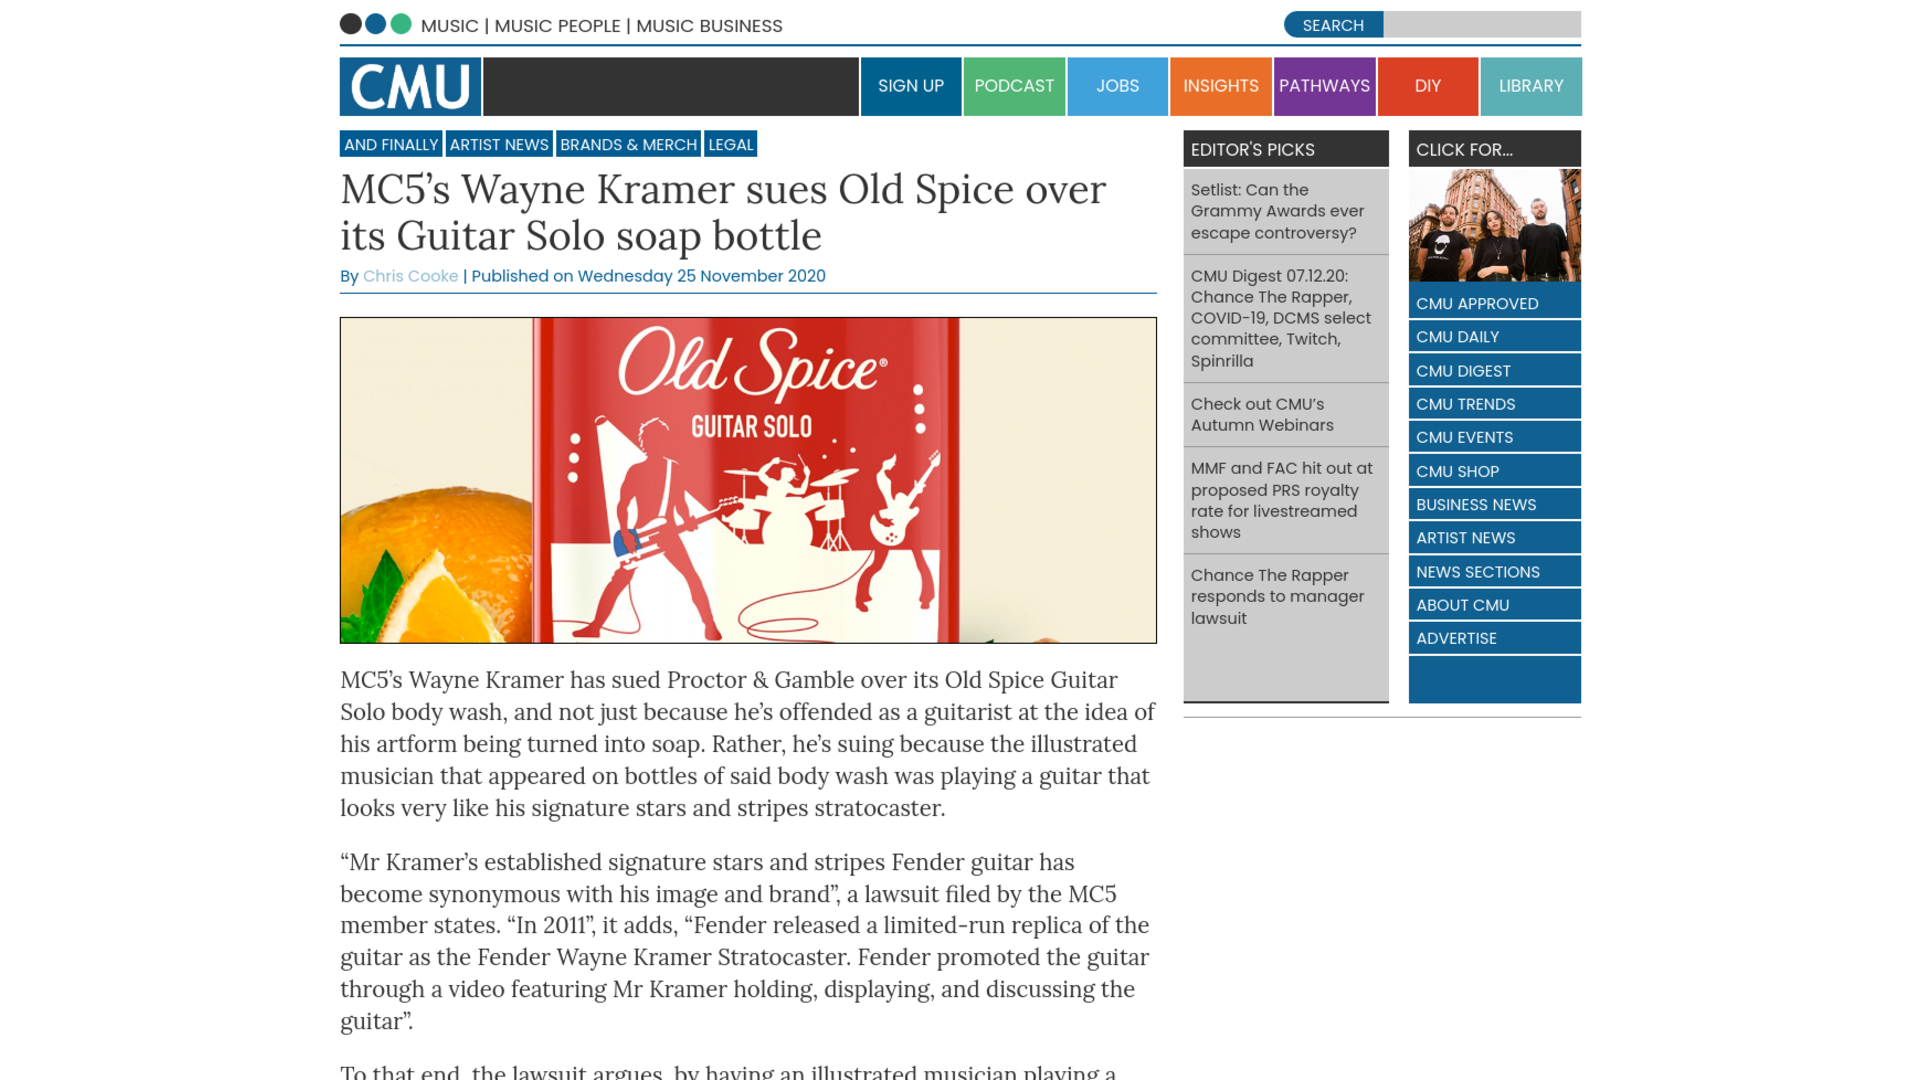 Fairness Rocks News MC5's Wayne Kramer sues Old Spice over its Guitar Solo soap bottle